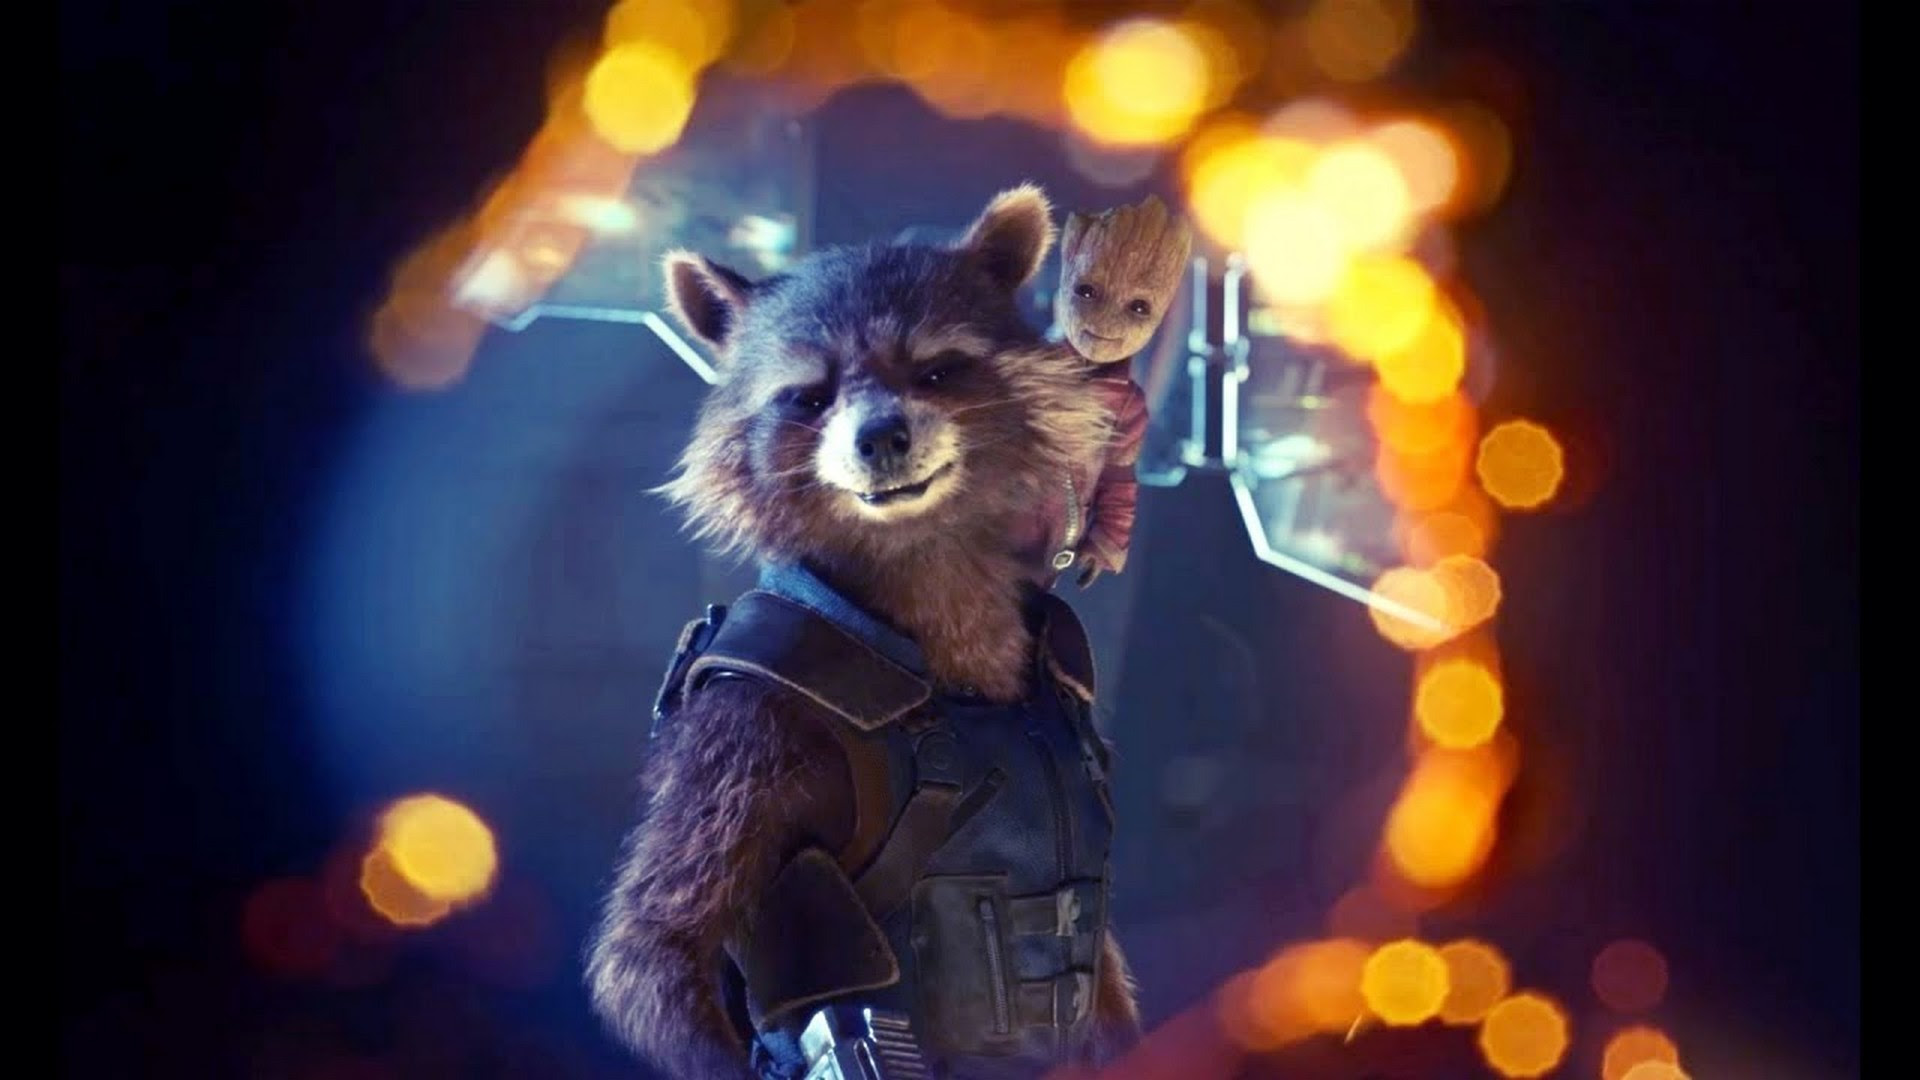 Hd Rocket Raccoon Wallpaper 67 Images